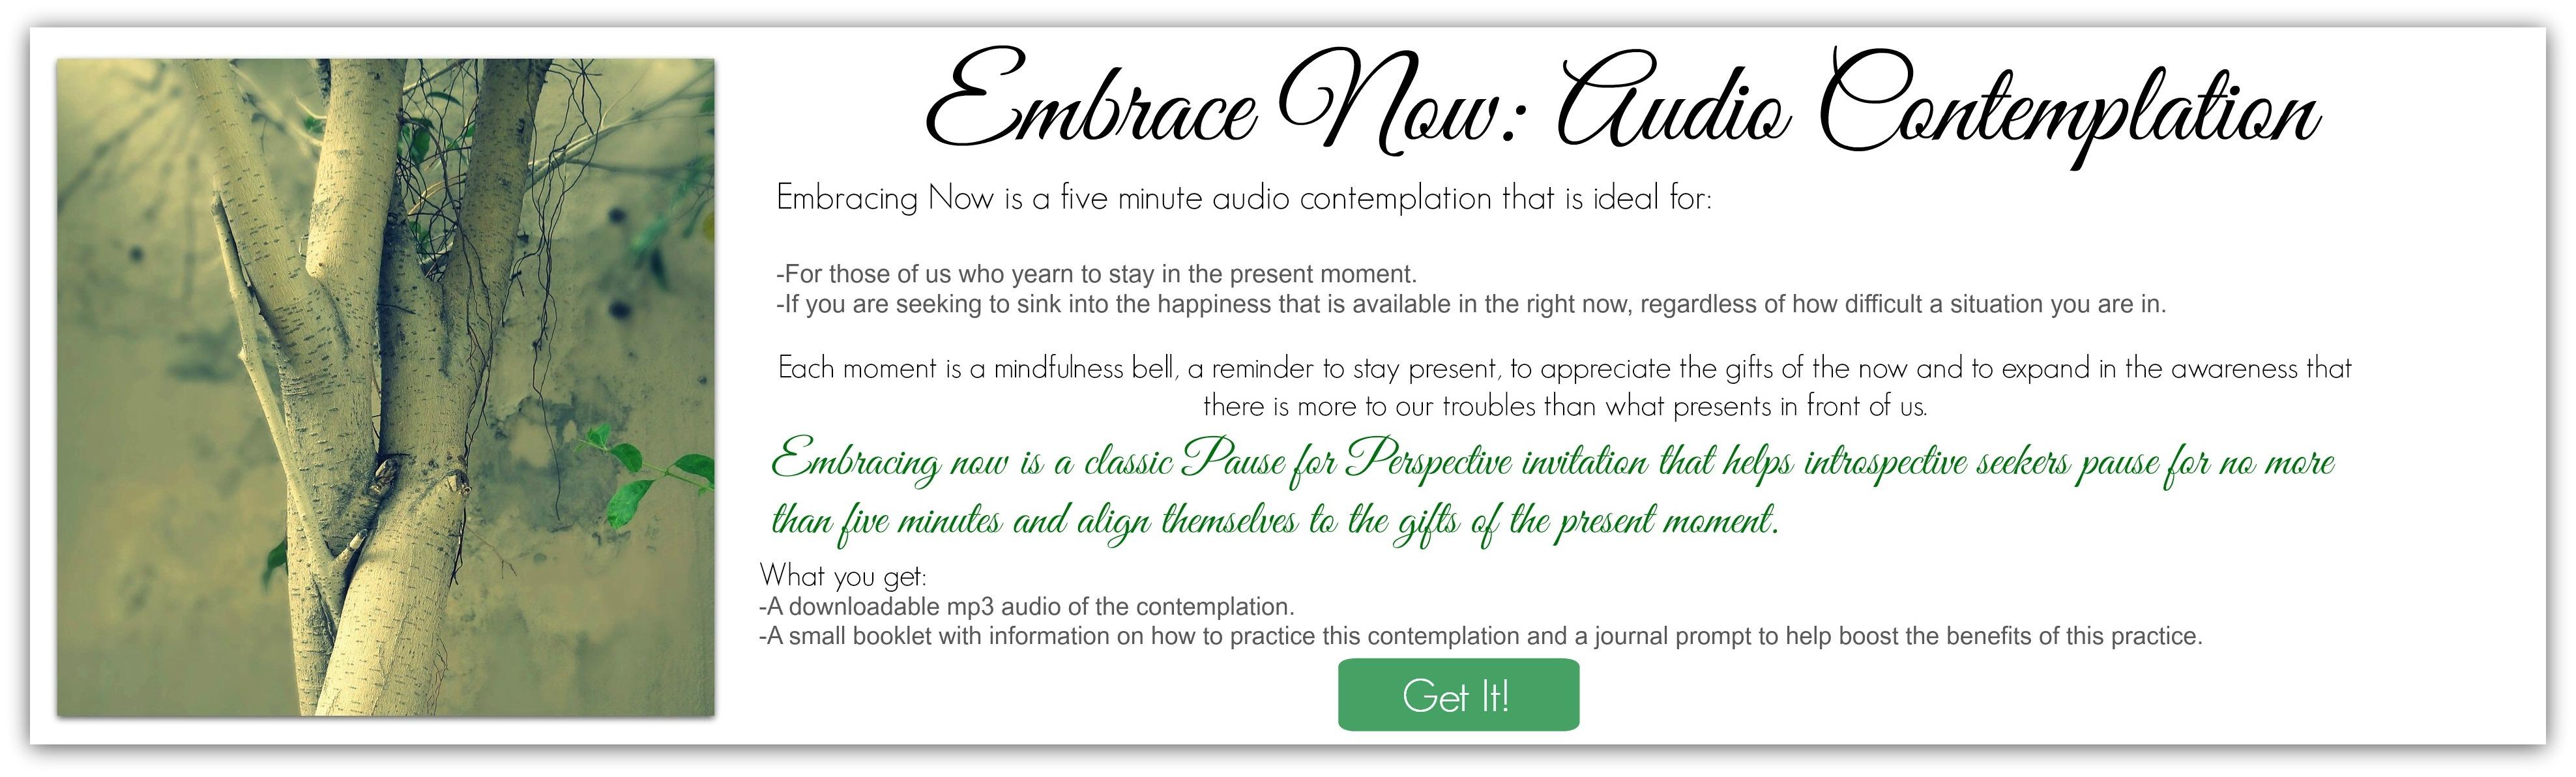 Embrace Now Audio Meditation